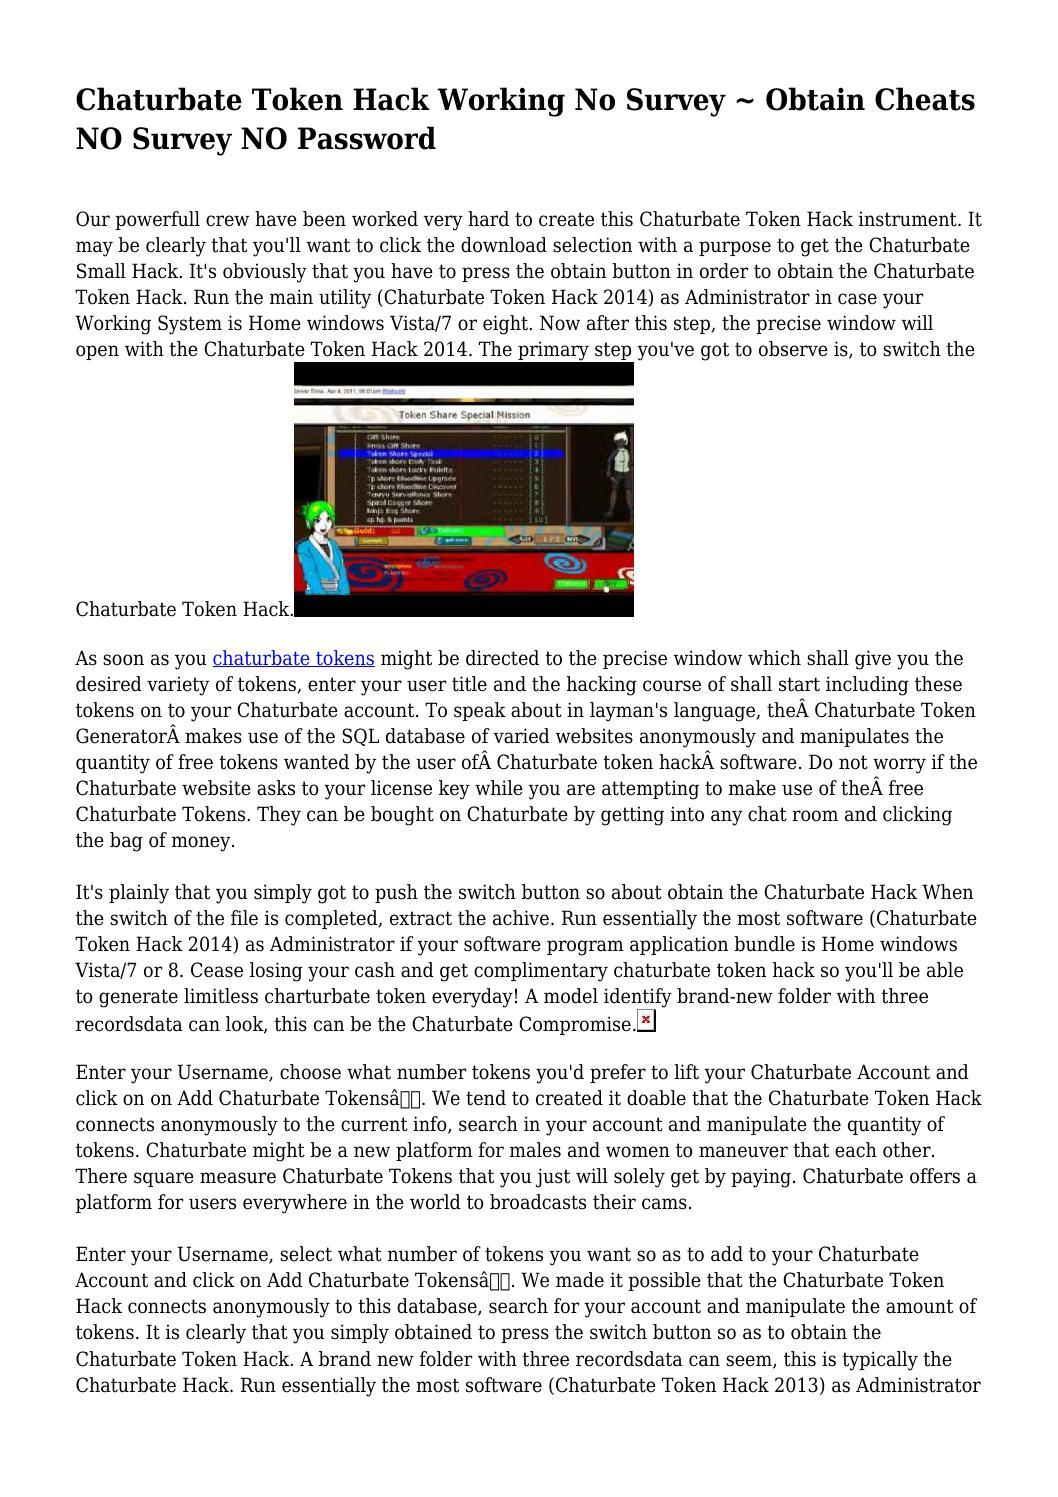 Chaturbate Token Hack Working No Survey ~ Obtain Cheats NO ...